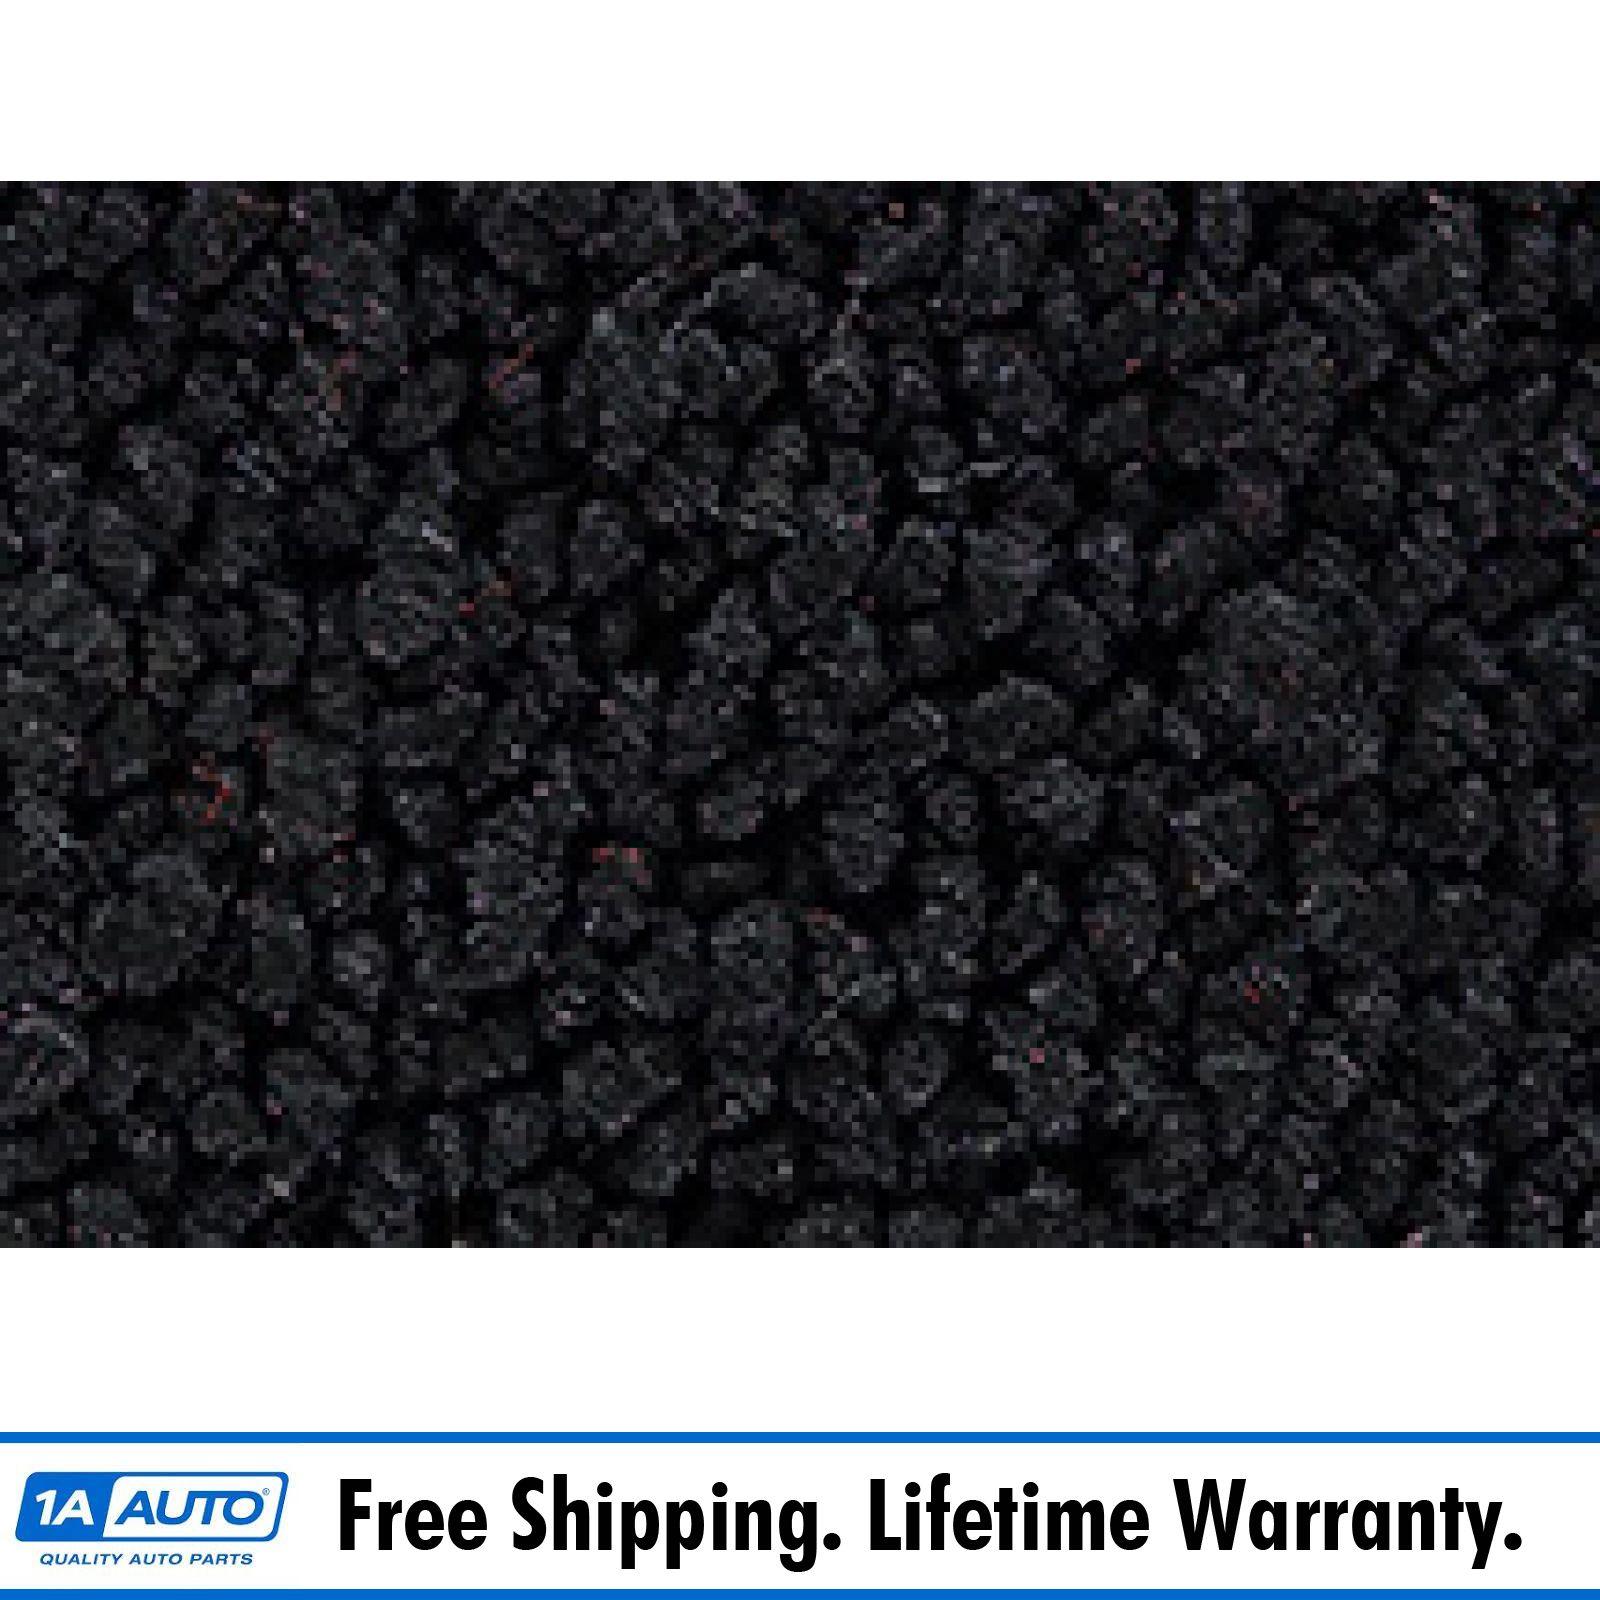 uxcell Car Dash Sun Cover Dashboard Mat Carpet for Toyota Land Cruiser 02-07